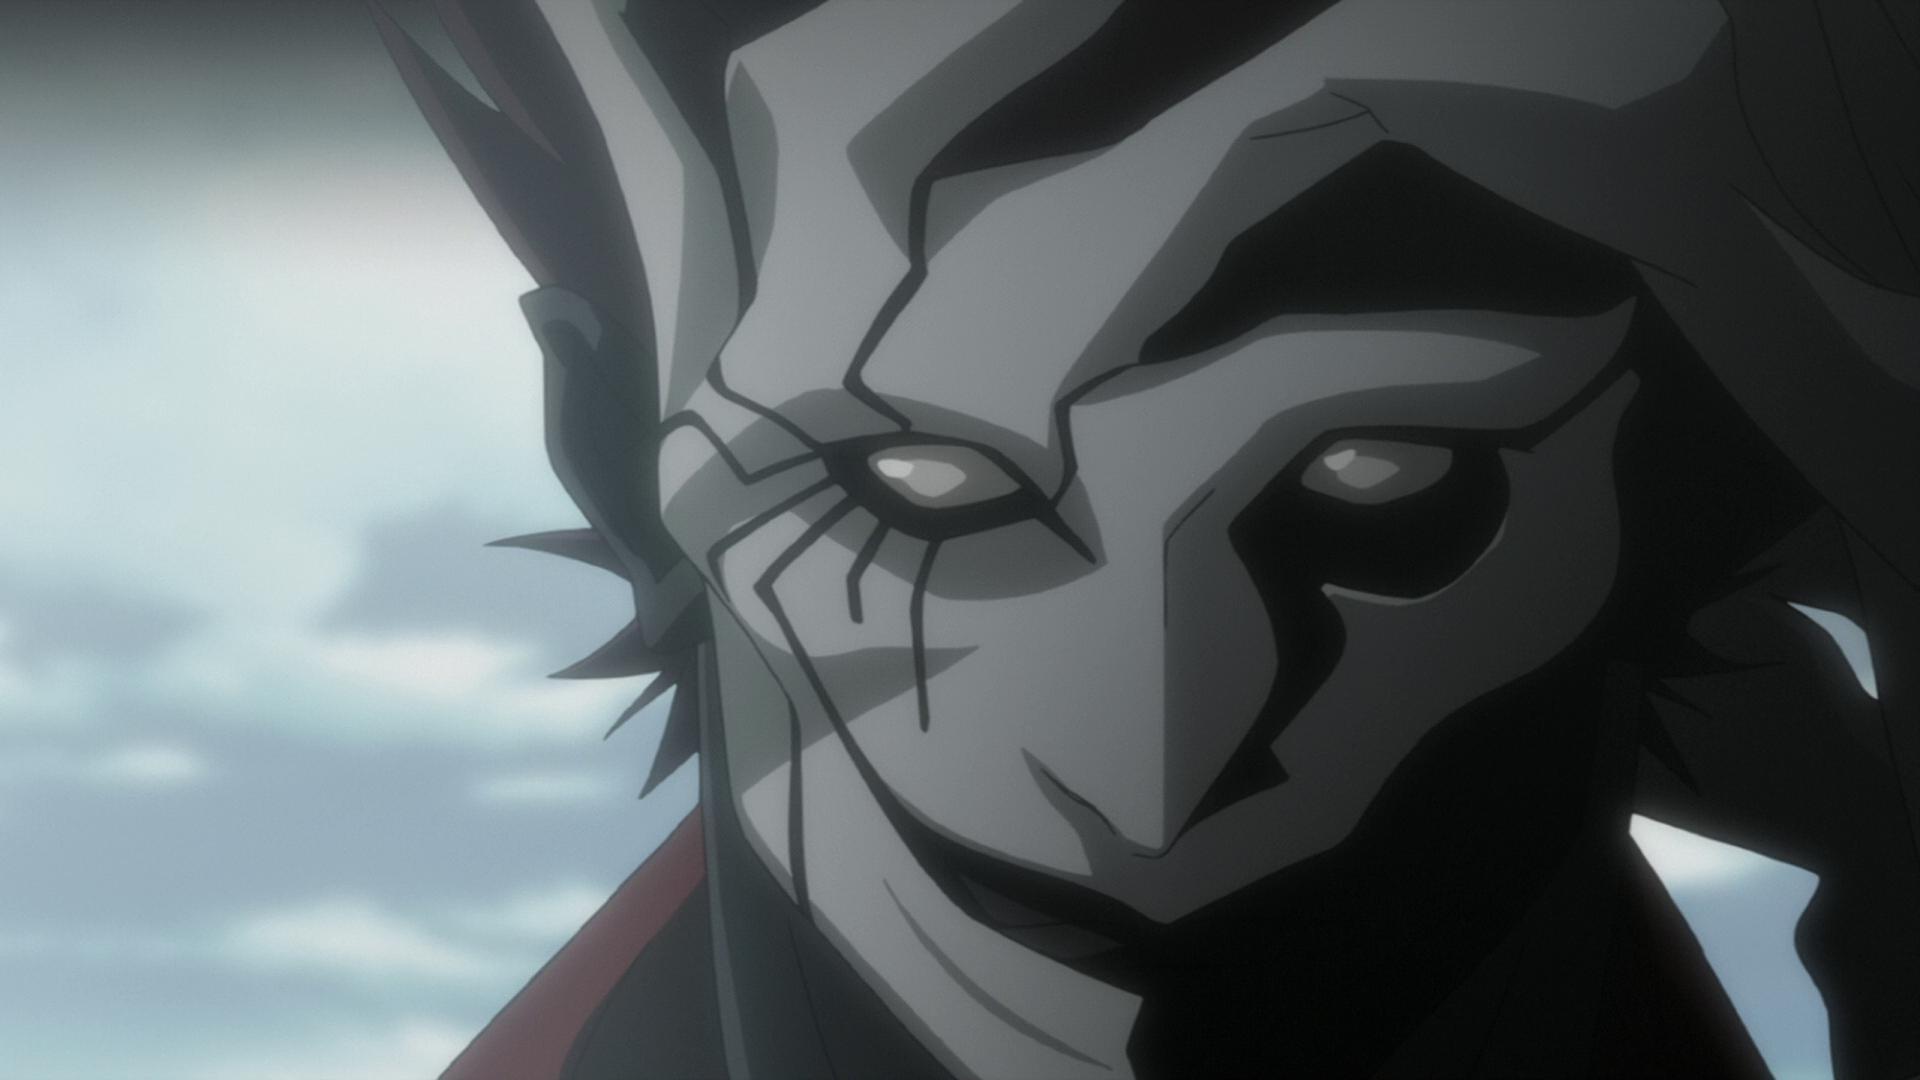 Res: 1920x1080, BD-Komplettbox von »Ergo Proxy« ab sofort vorbestellbar » Anime2You - your  anime-news source